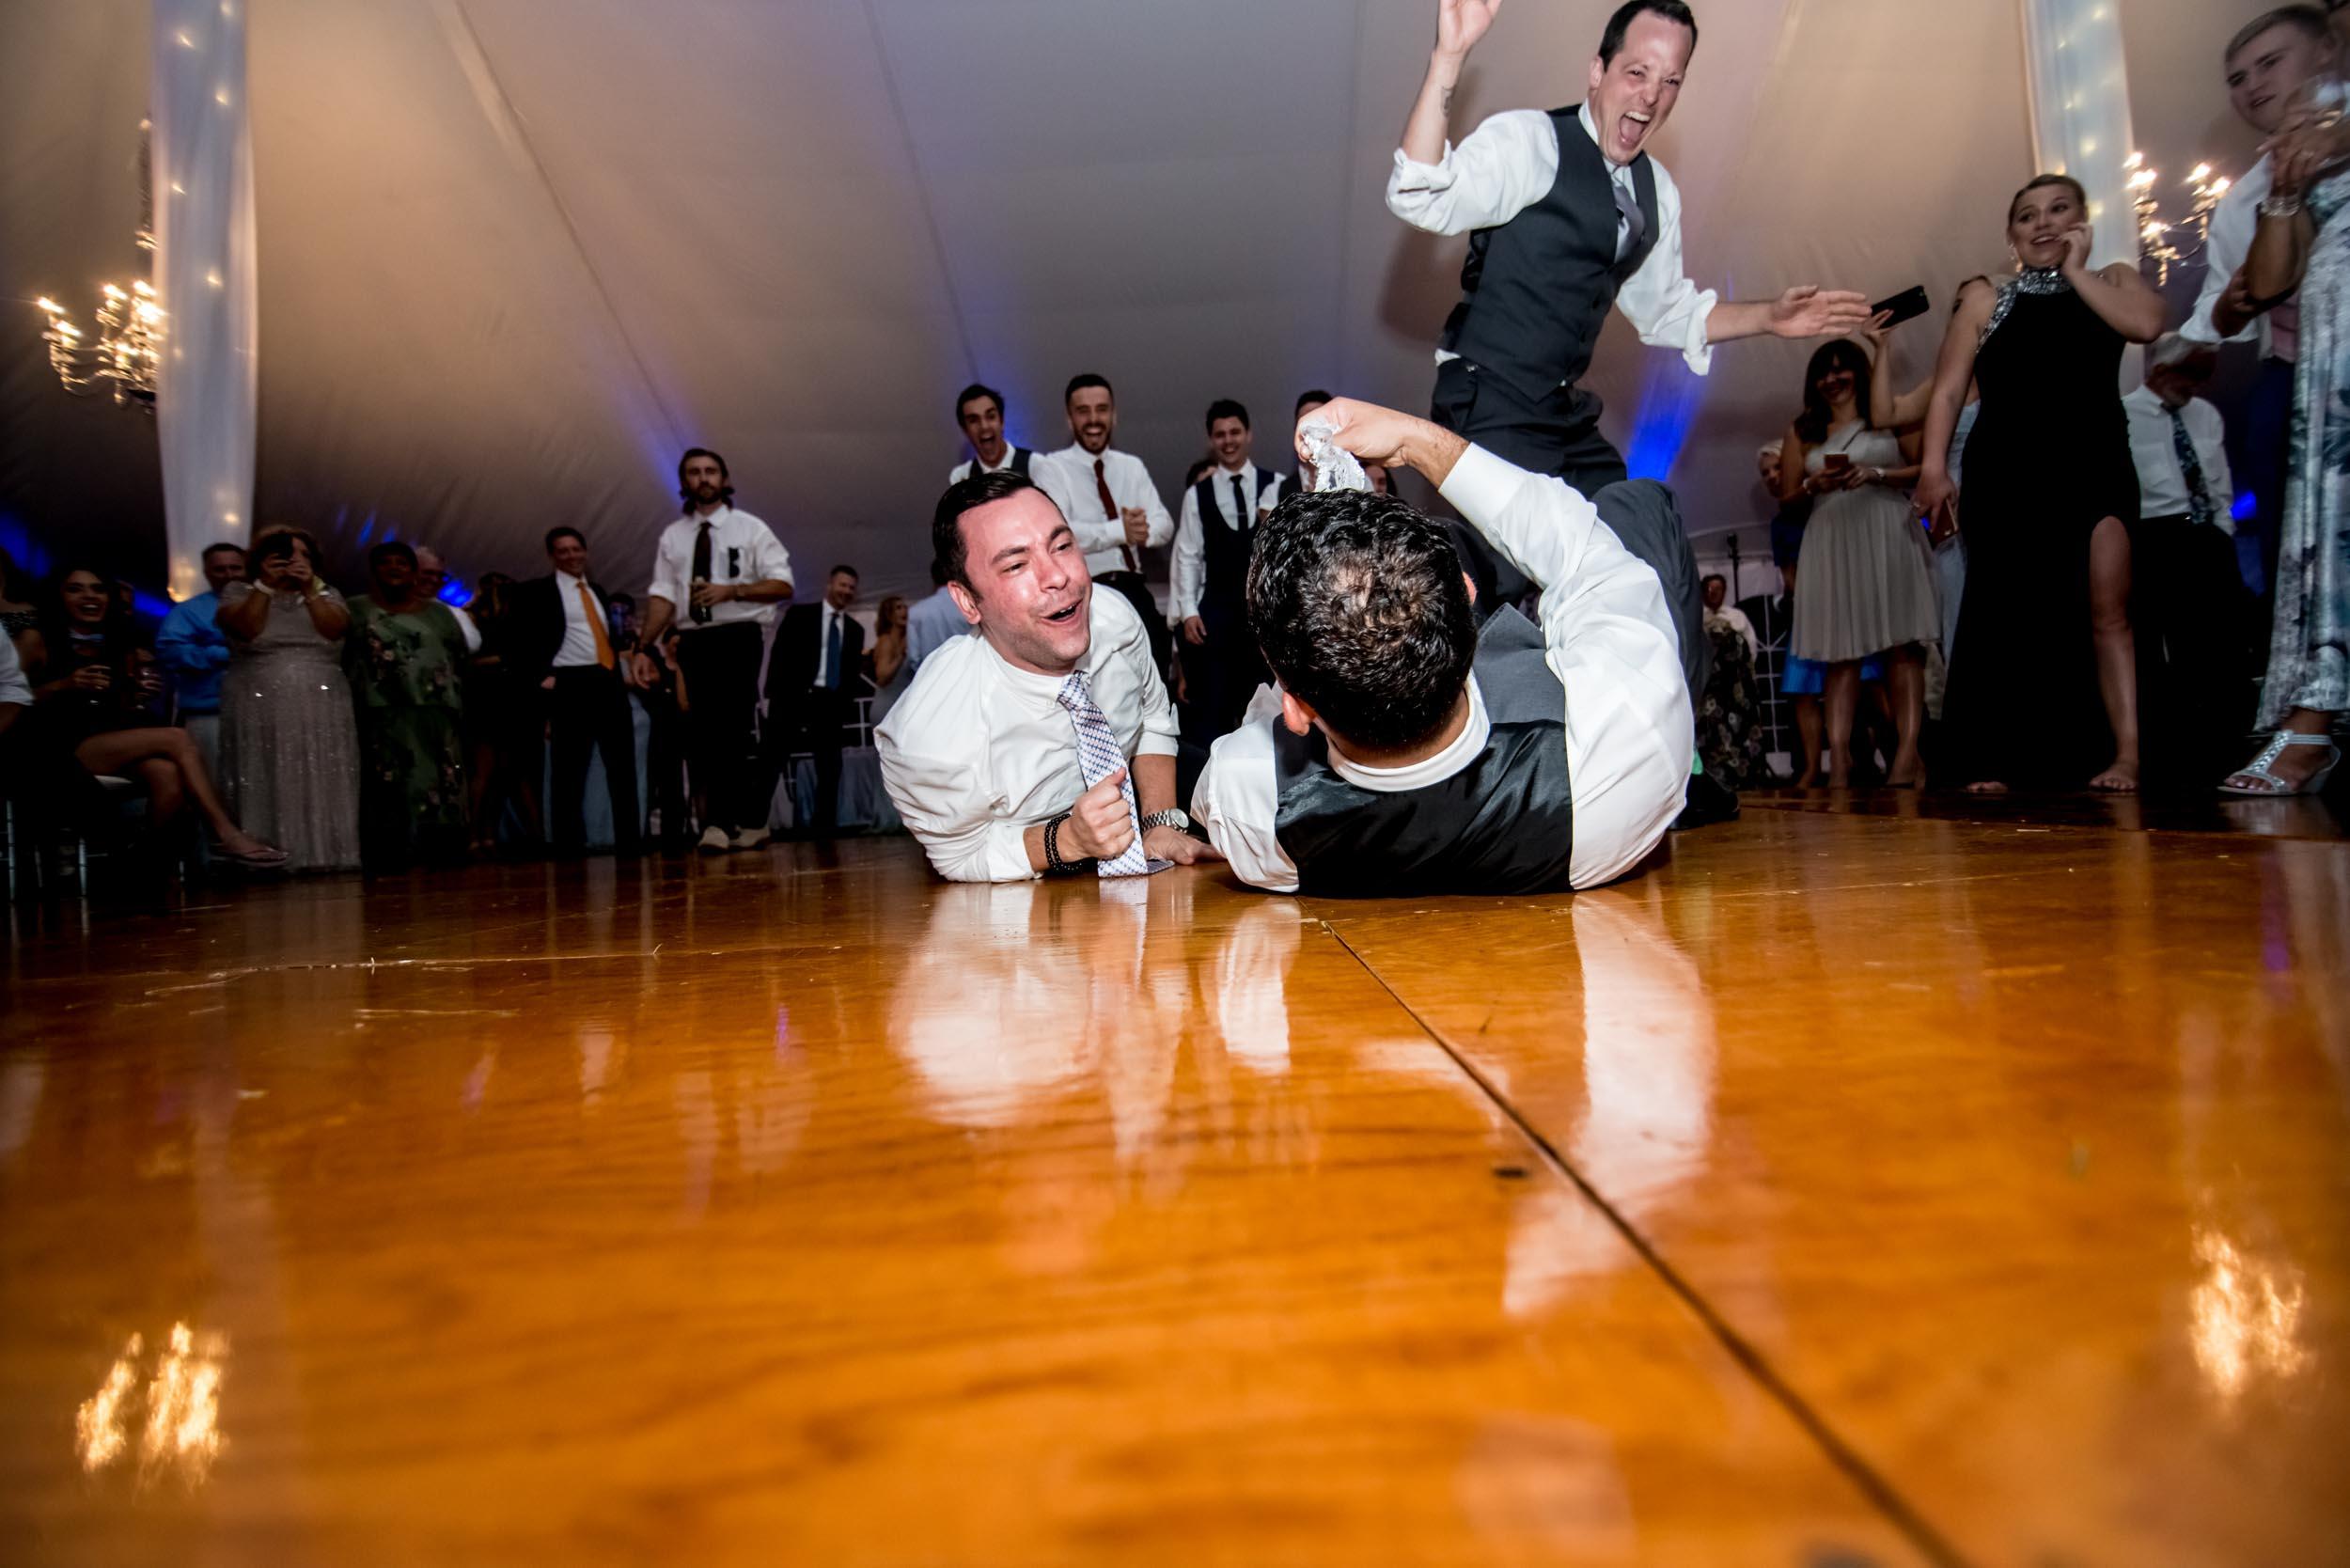 dc+metro+wedding+photographer+vadym+guliuk+photography+wedding+garter+toss-2027.jpg